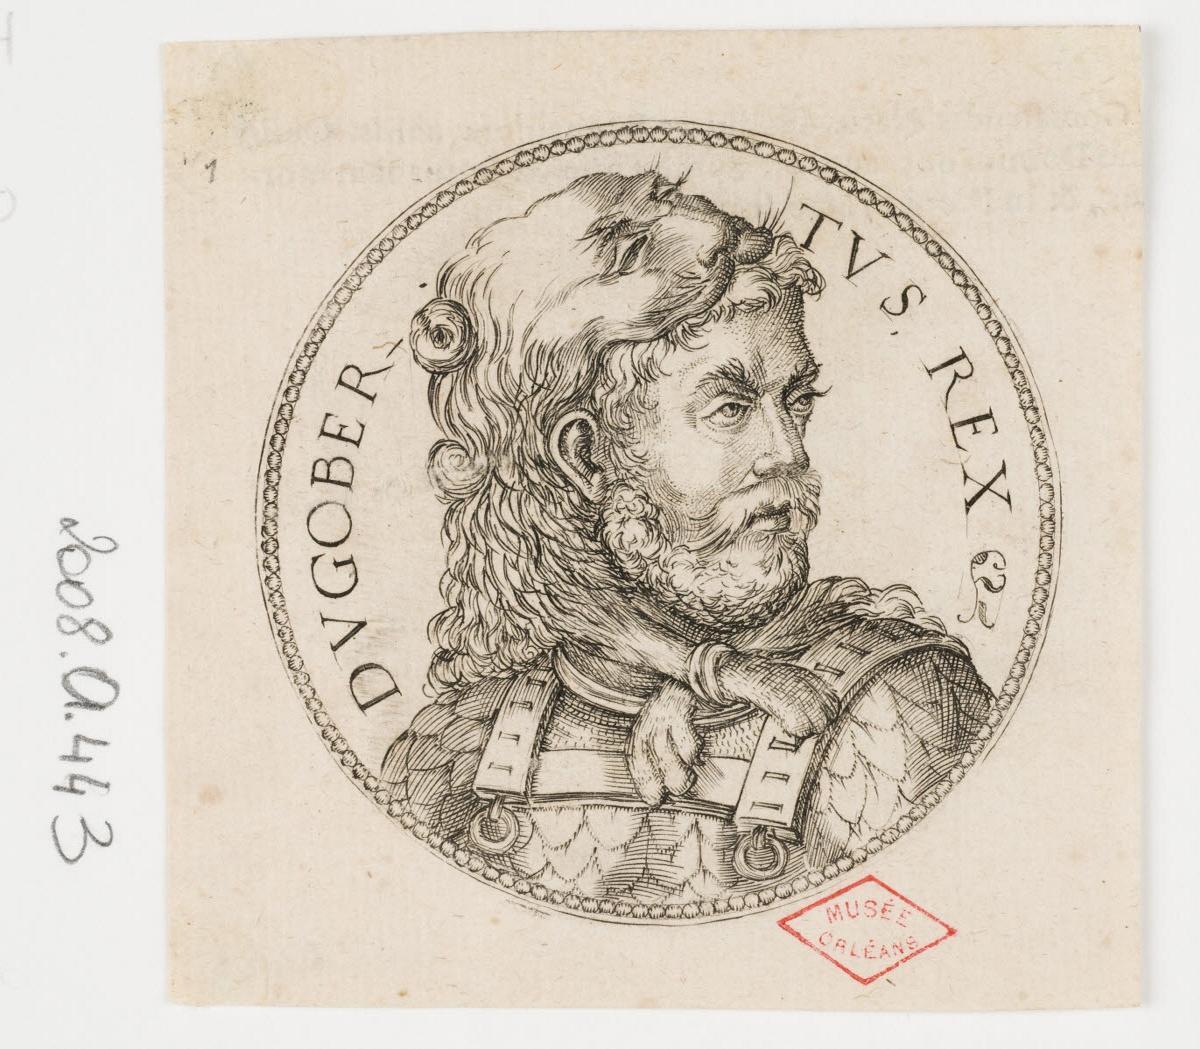 WOEIRIOT DE BOUZEY Pierre (inventeur, graveur) : Dagobert, roi d'Austrasie